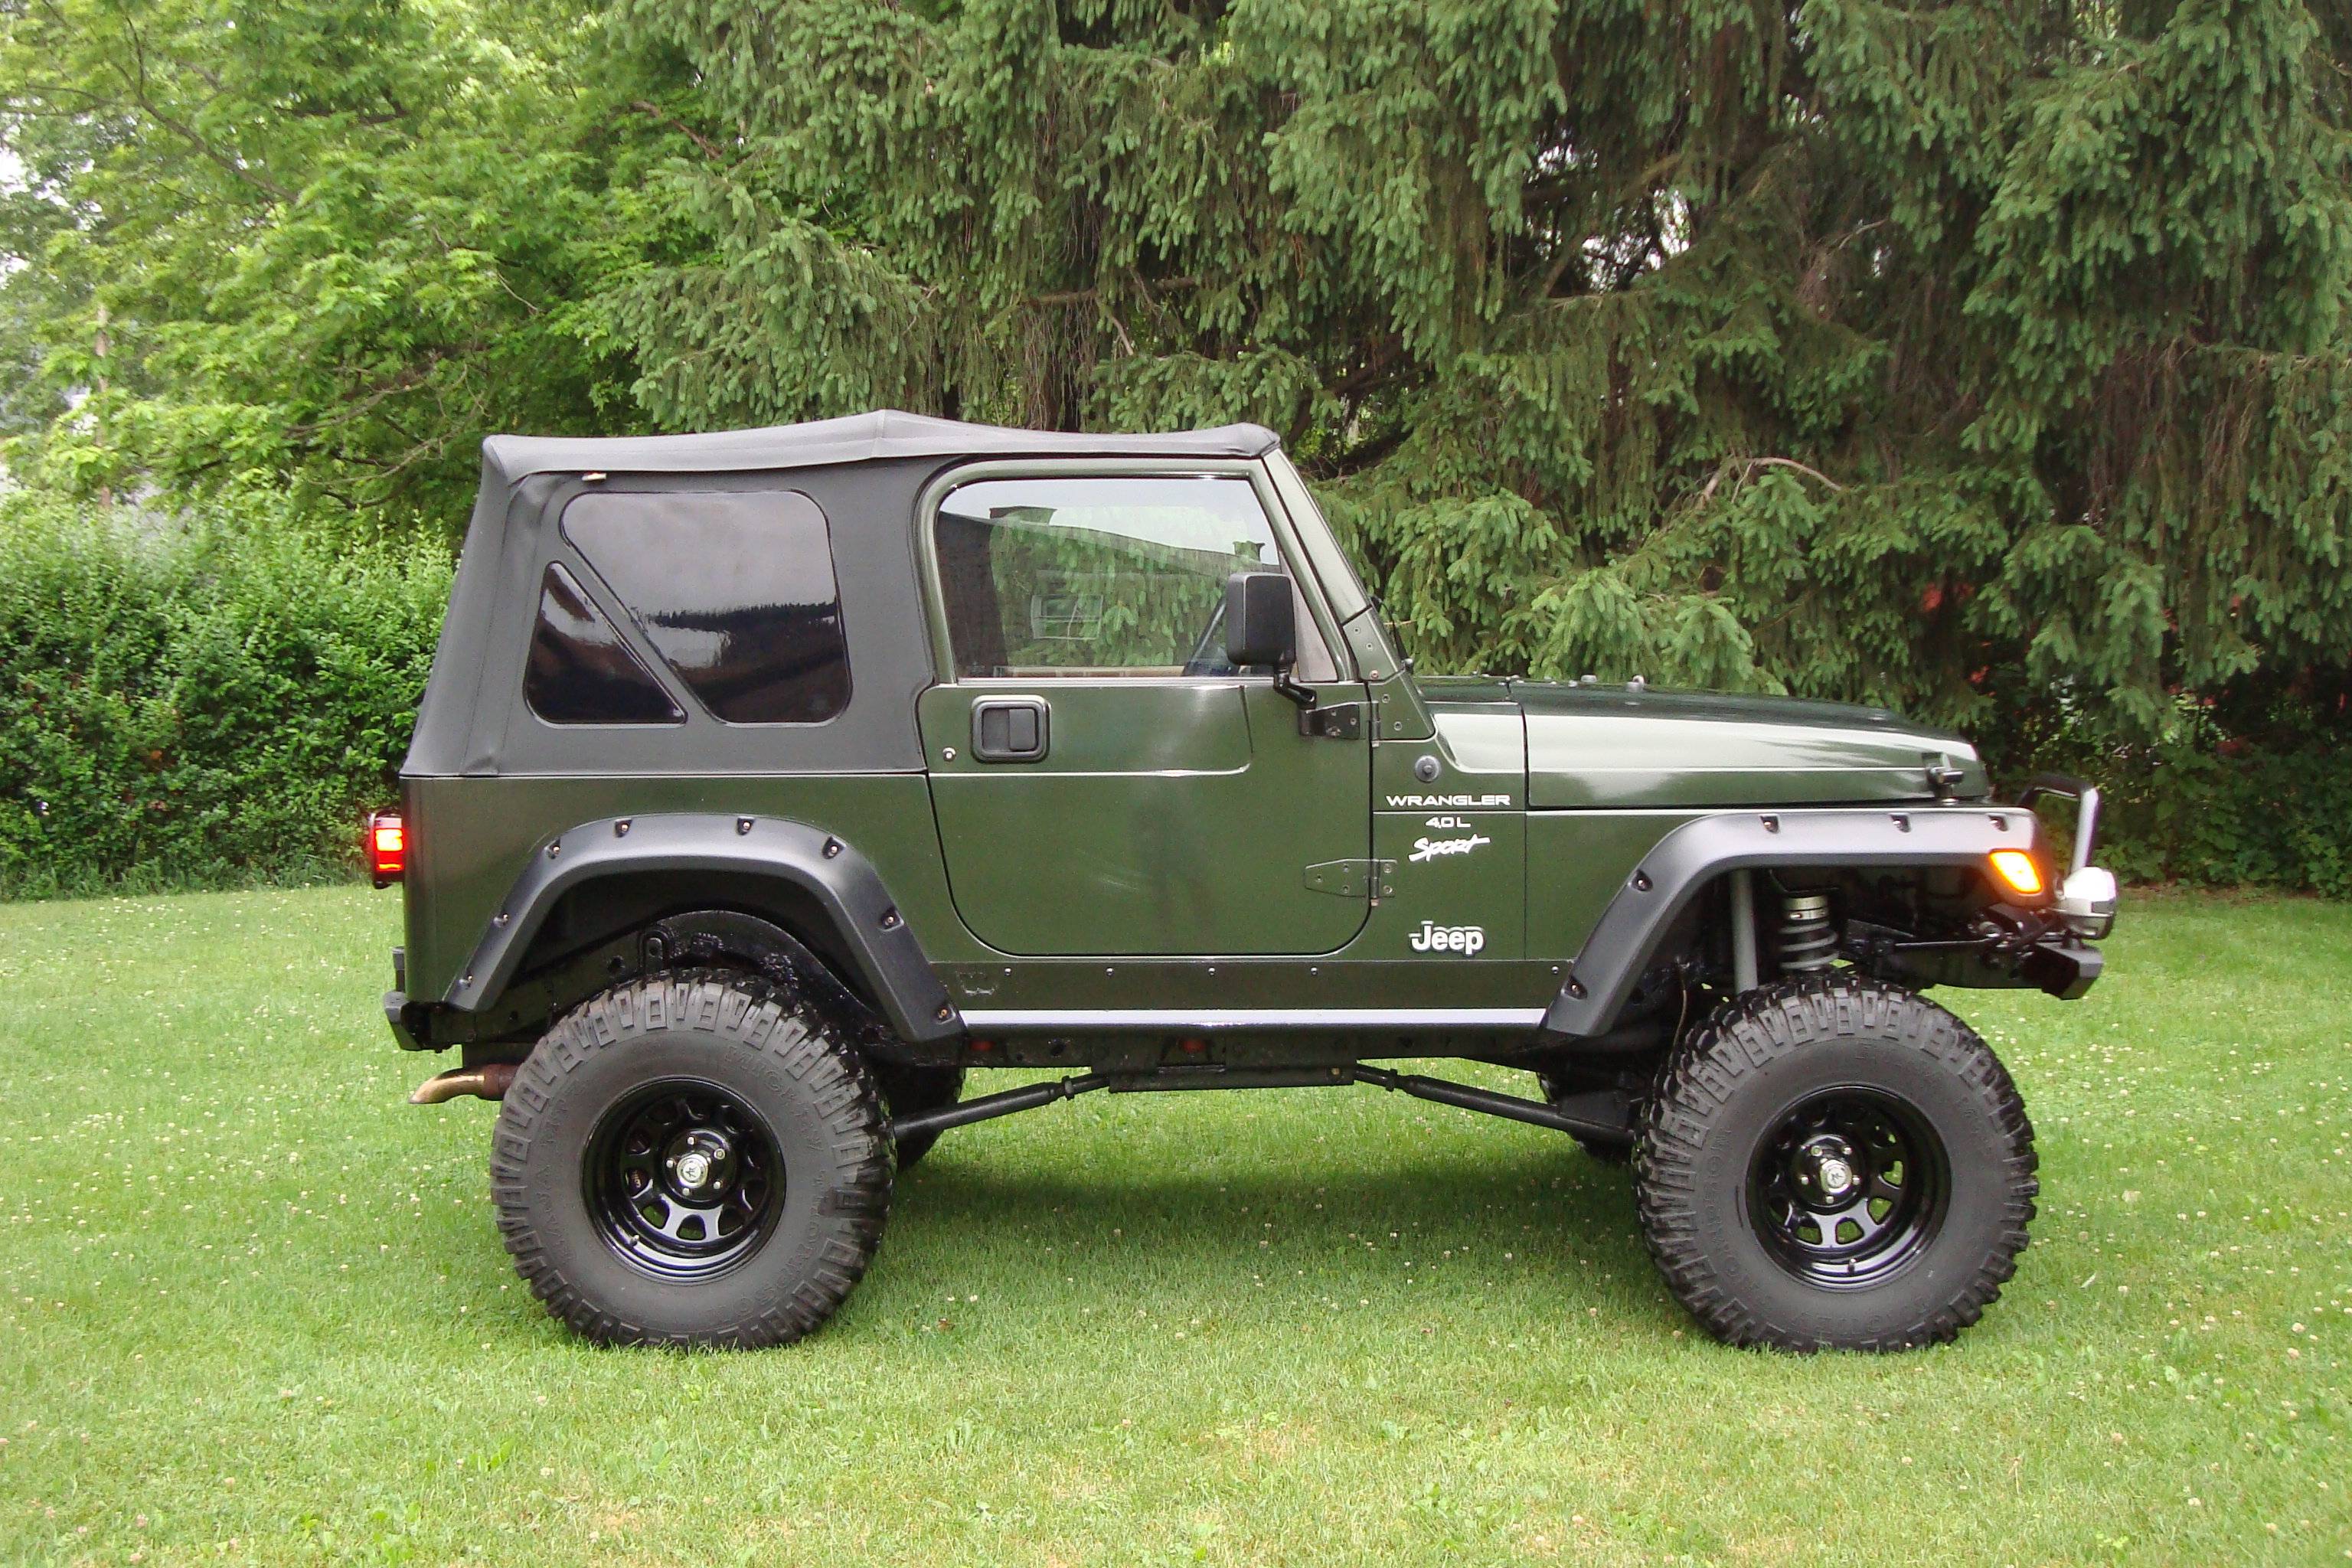 1998 jeep wrangler 7 jeep wrangler 7